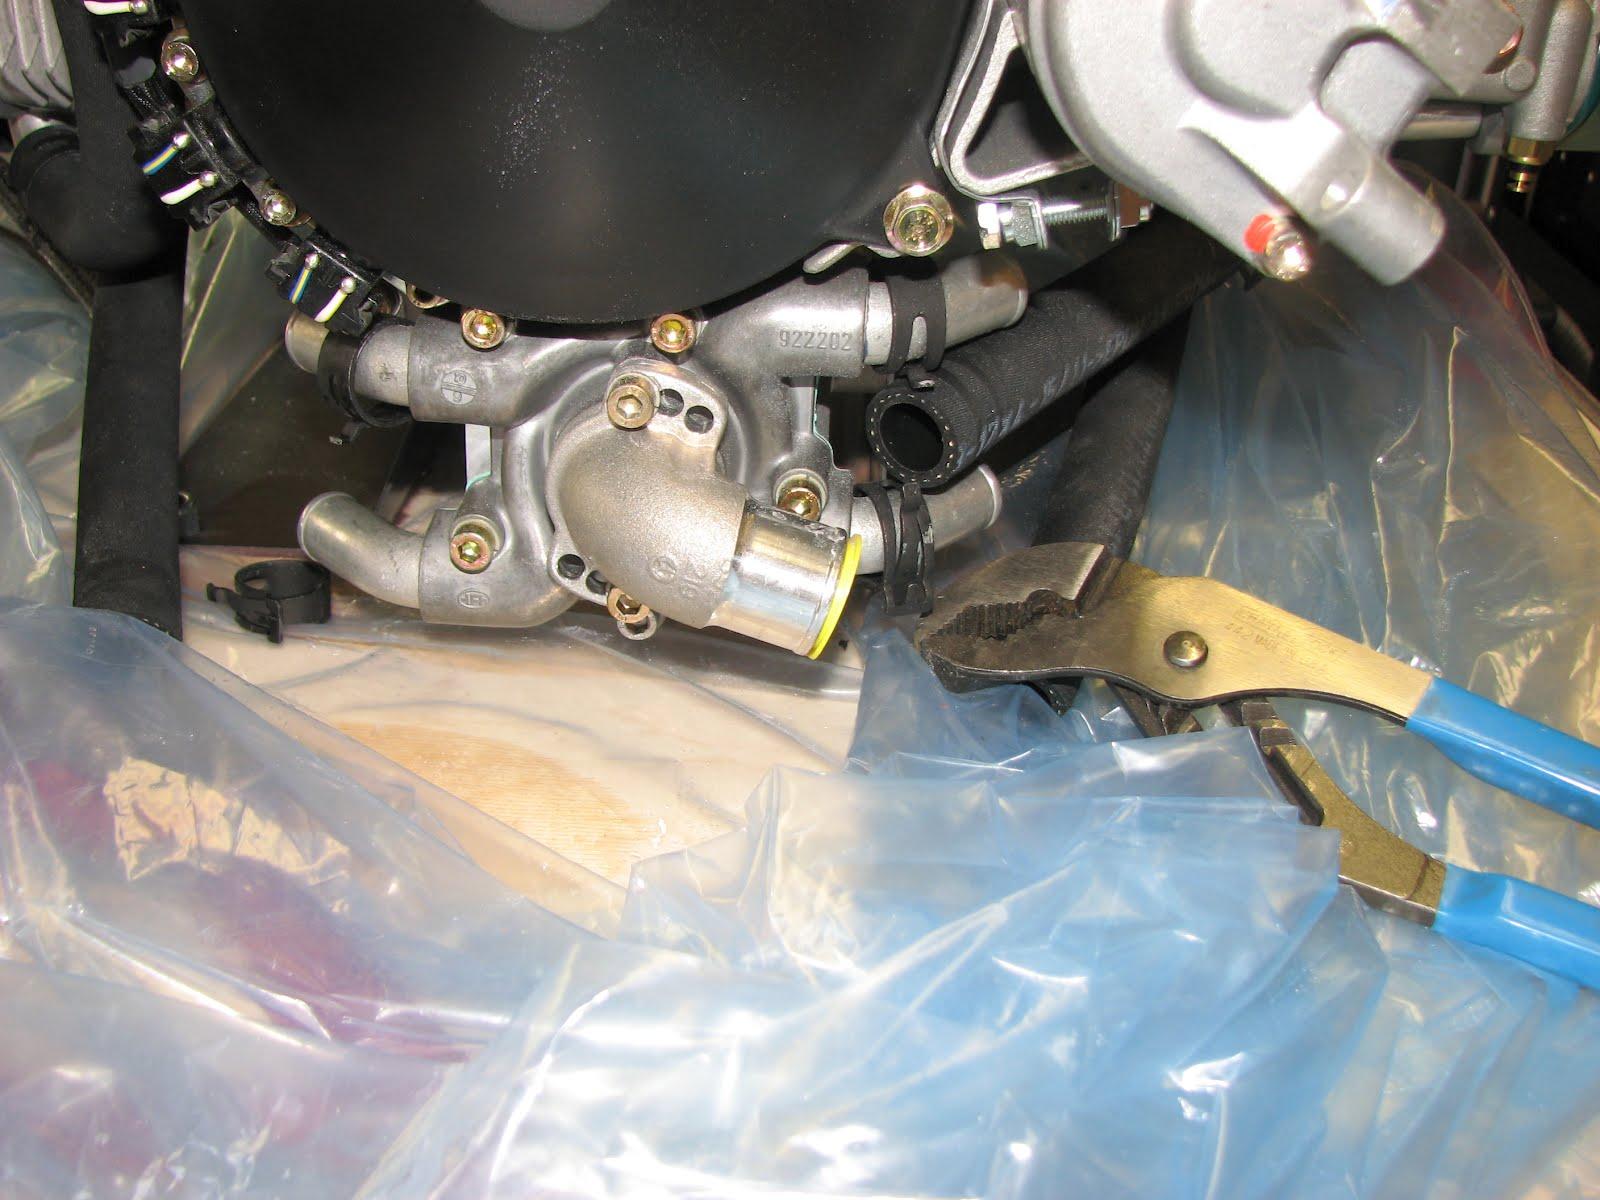 Torsten's RV-12: Cooling Shroud Installed